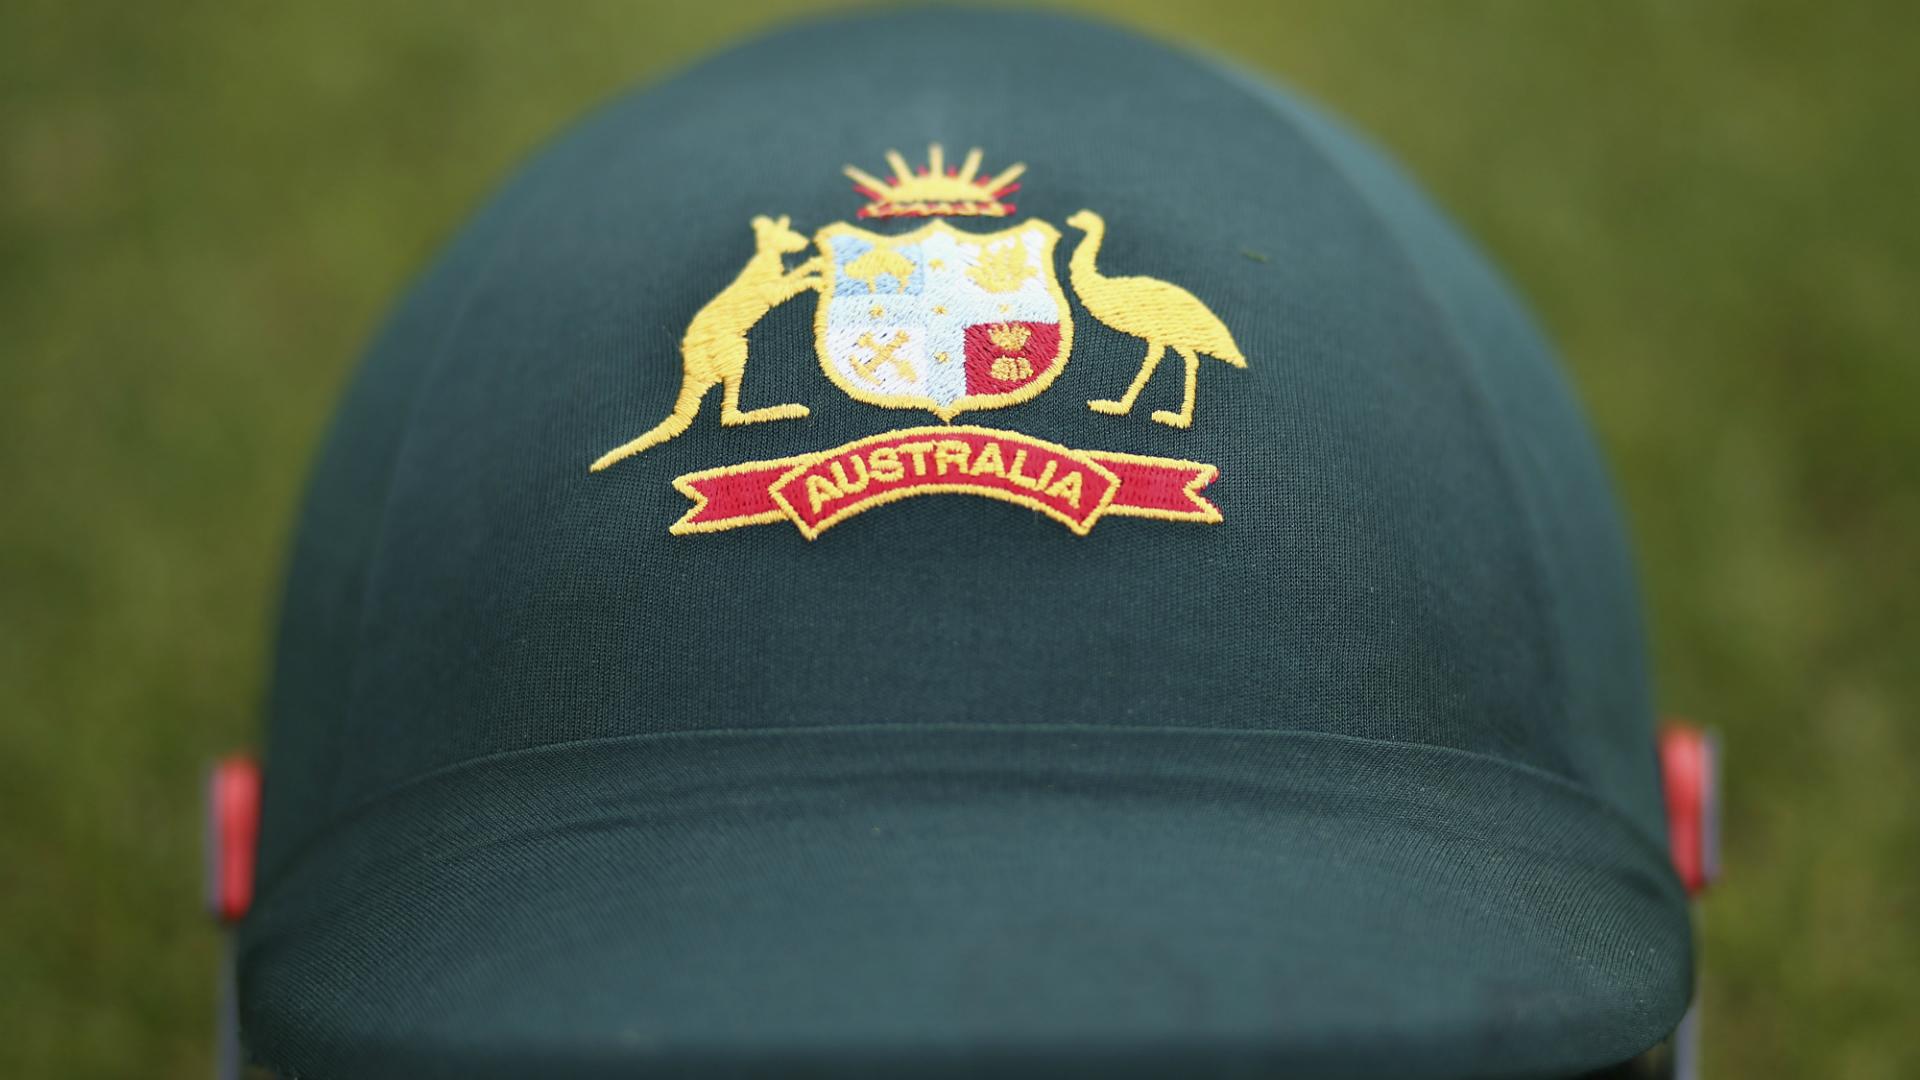 Australia postpone Afghanistan Test as part of schedule changes